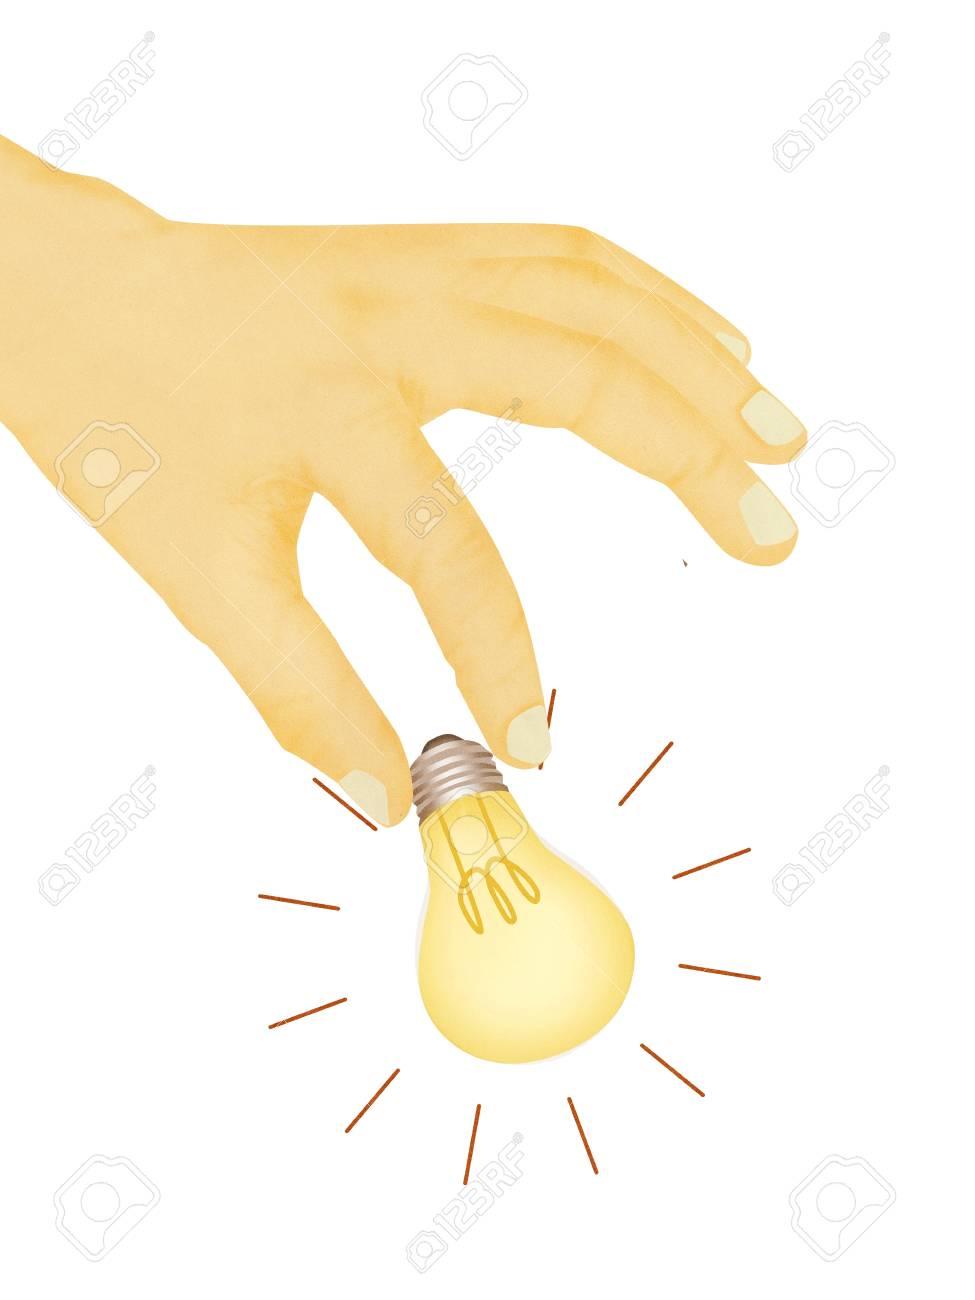 Paper texture ,  illustration of hand picking light bulb Stock Illustration - 14696675